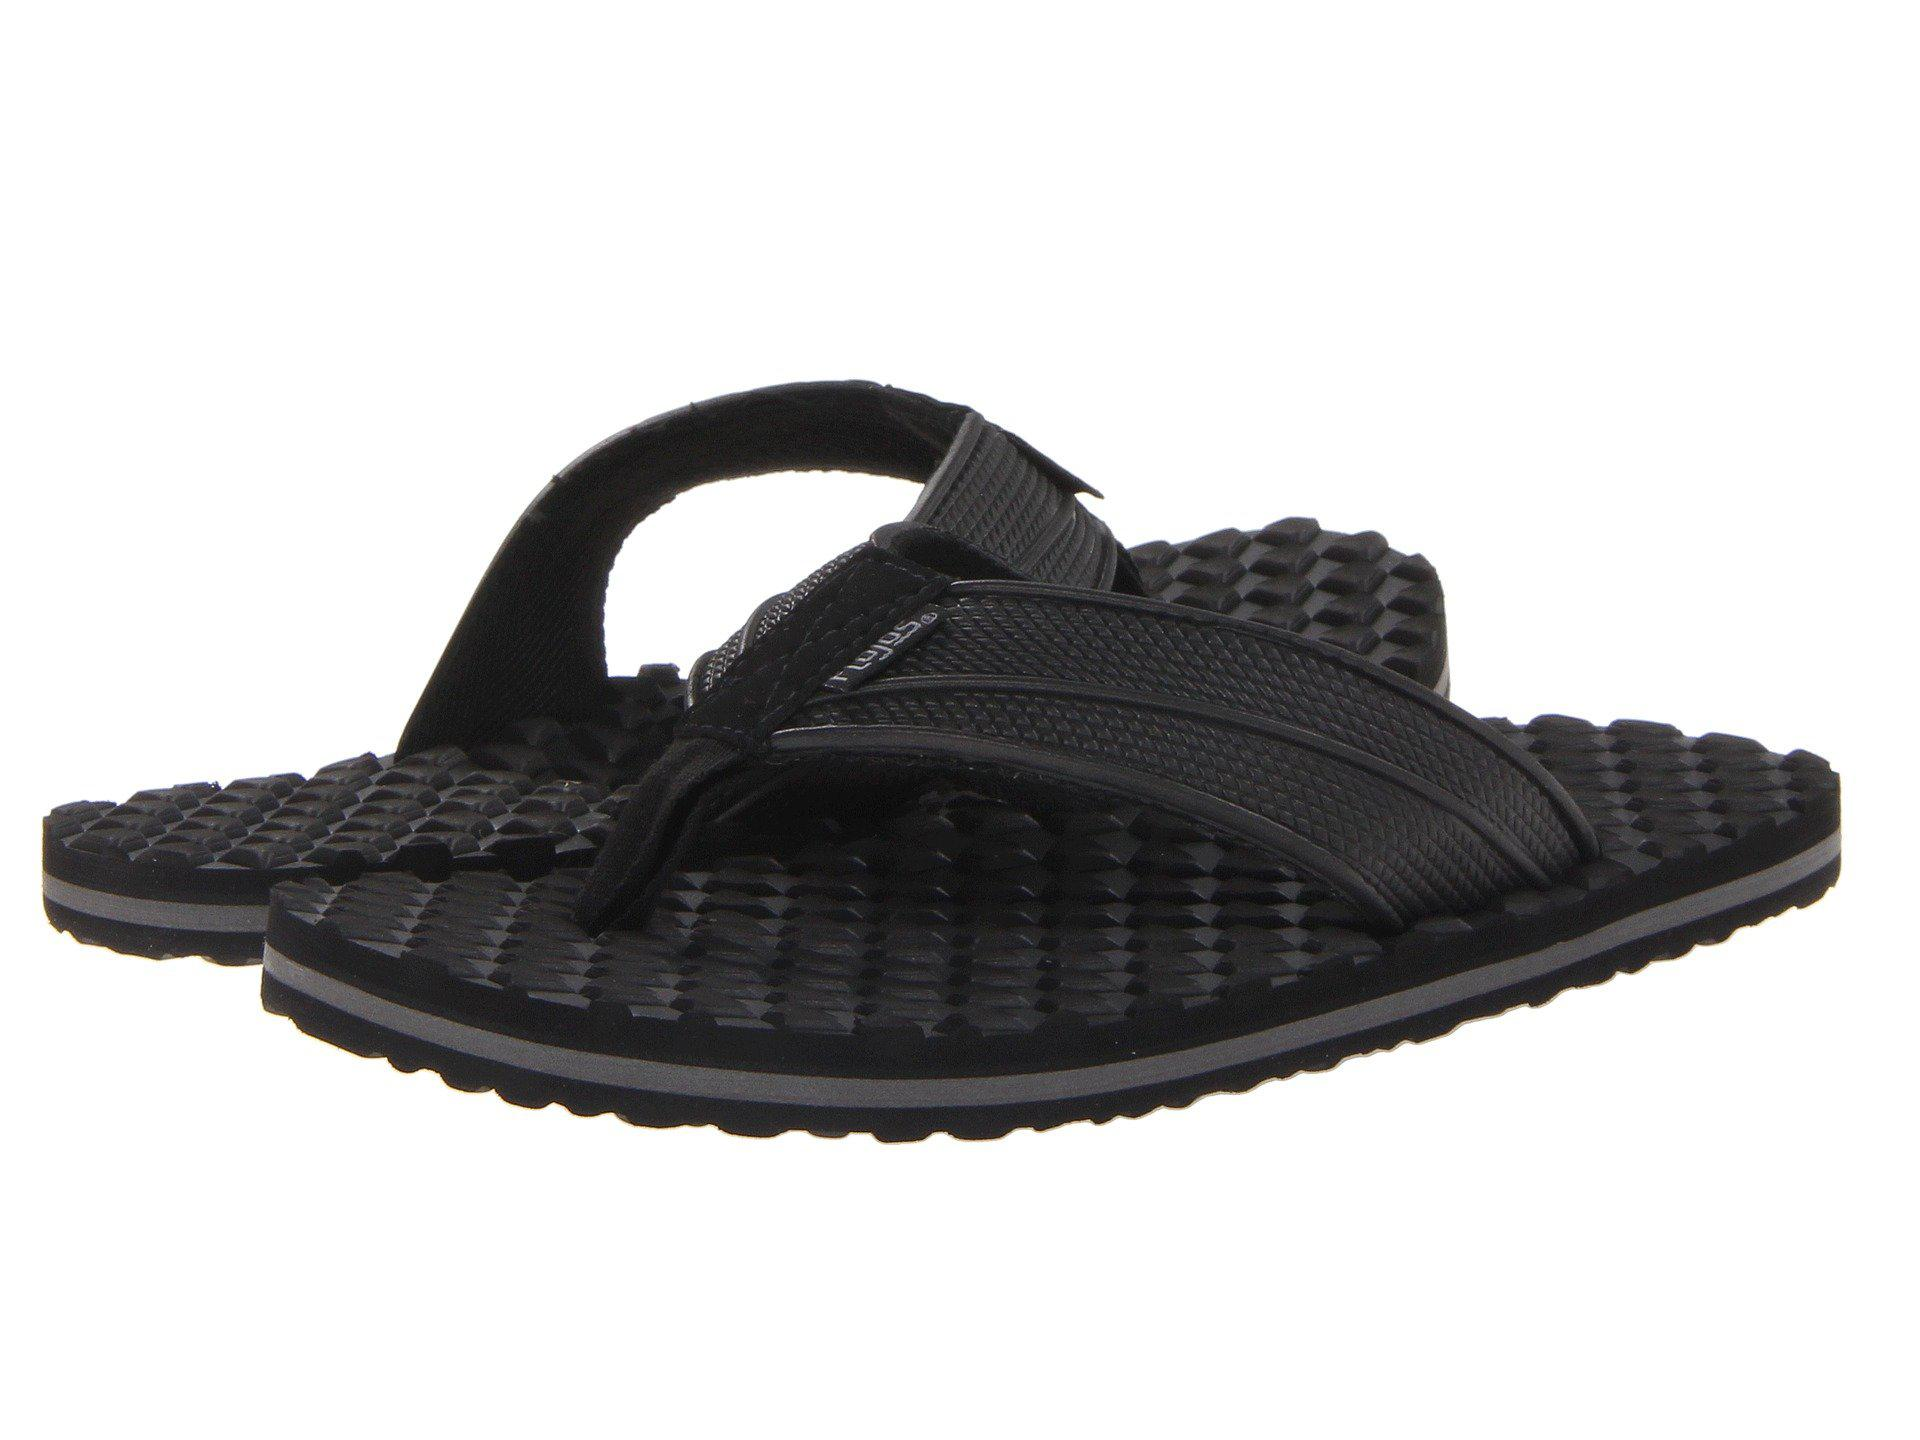 5982c2b1385c Lyst - Flojos Badlands (black light Gray) Men s Sandals in Black for Men